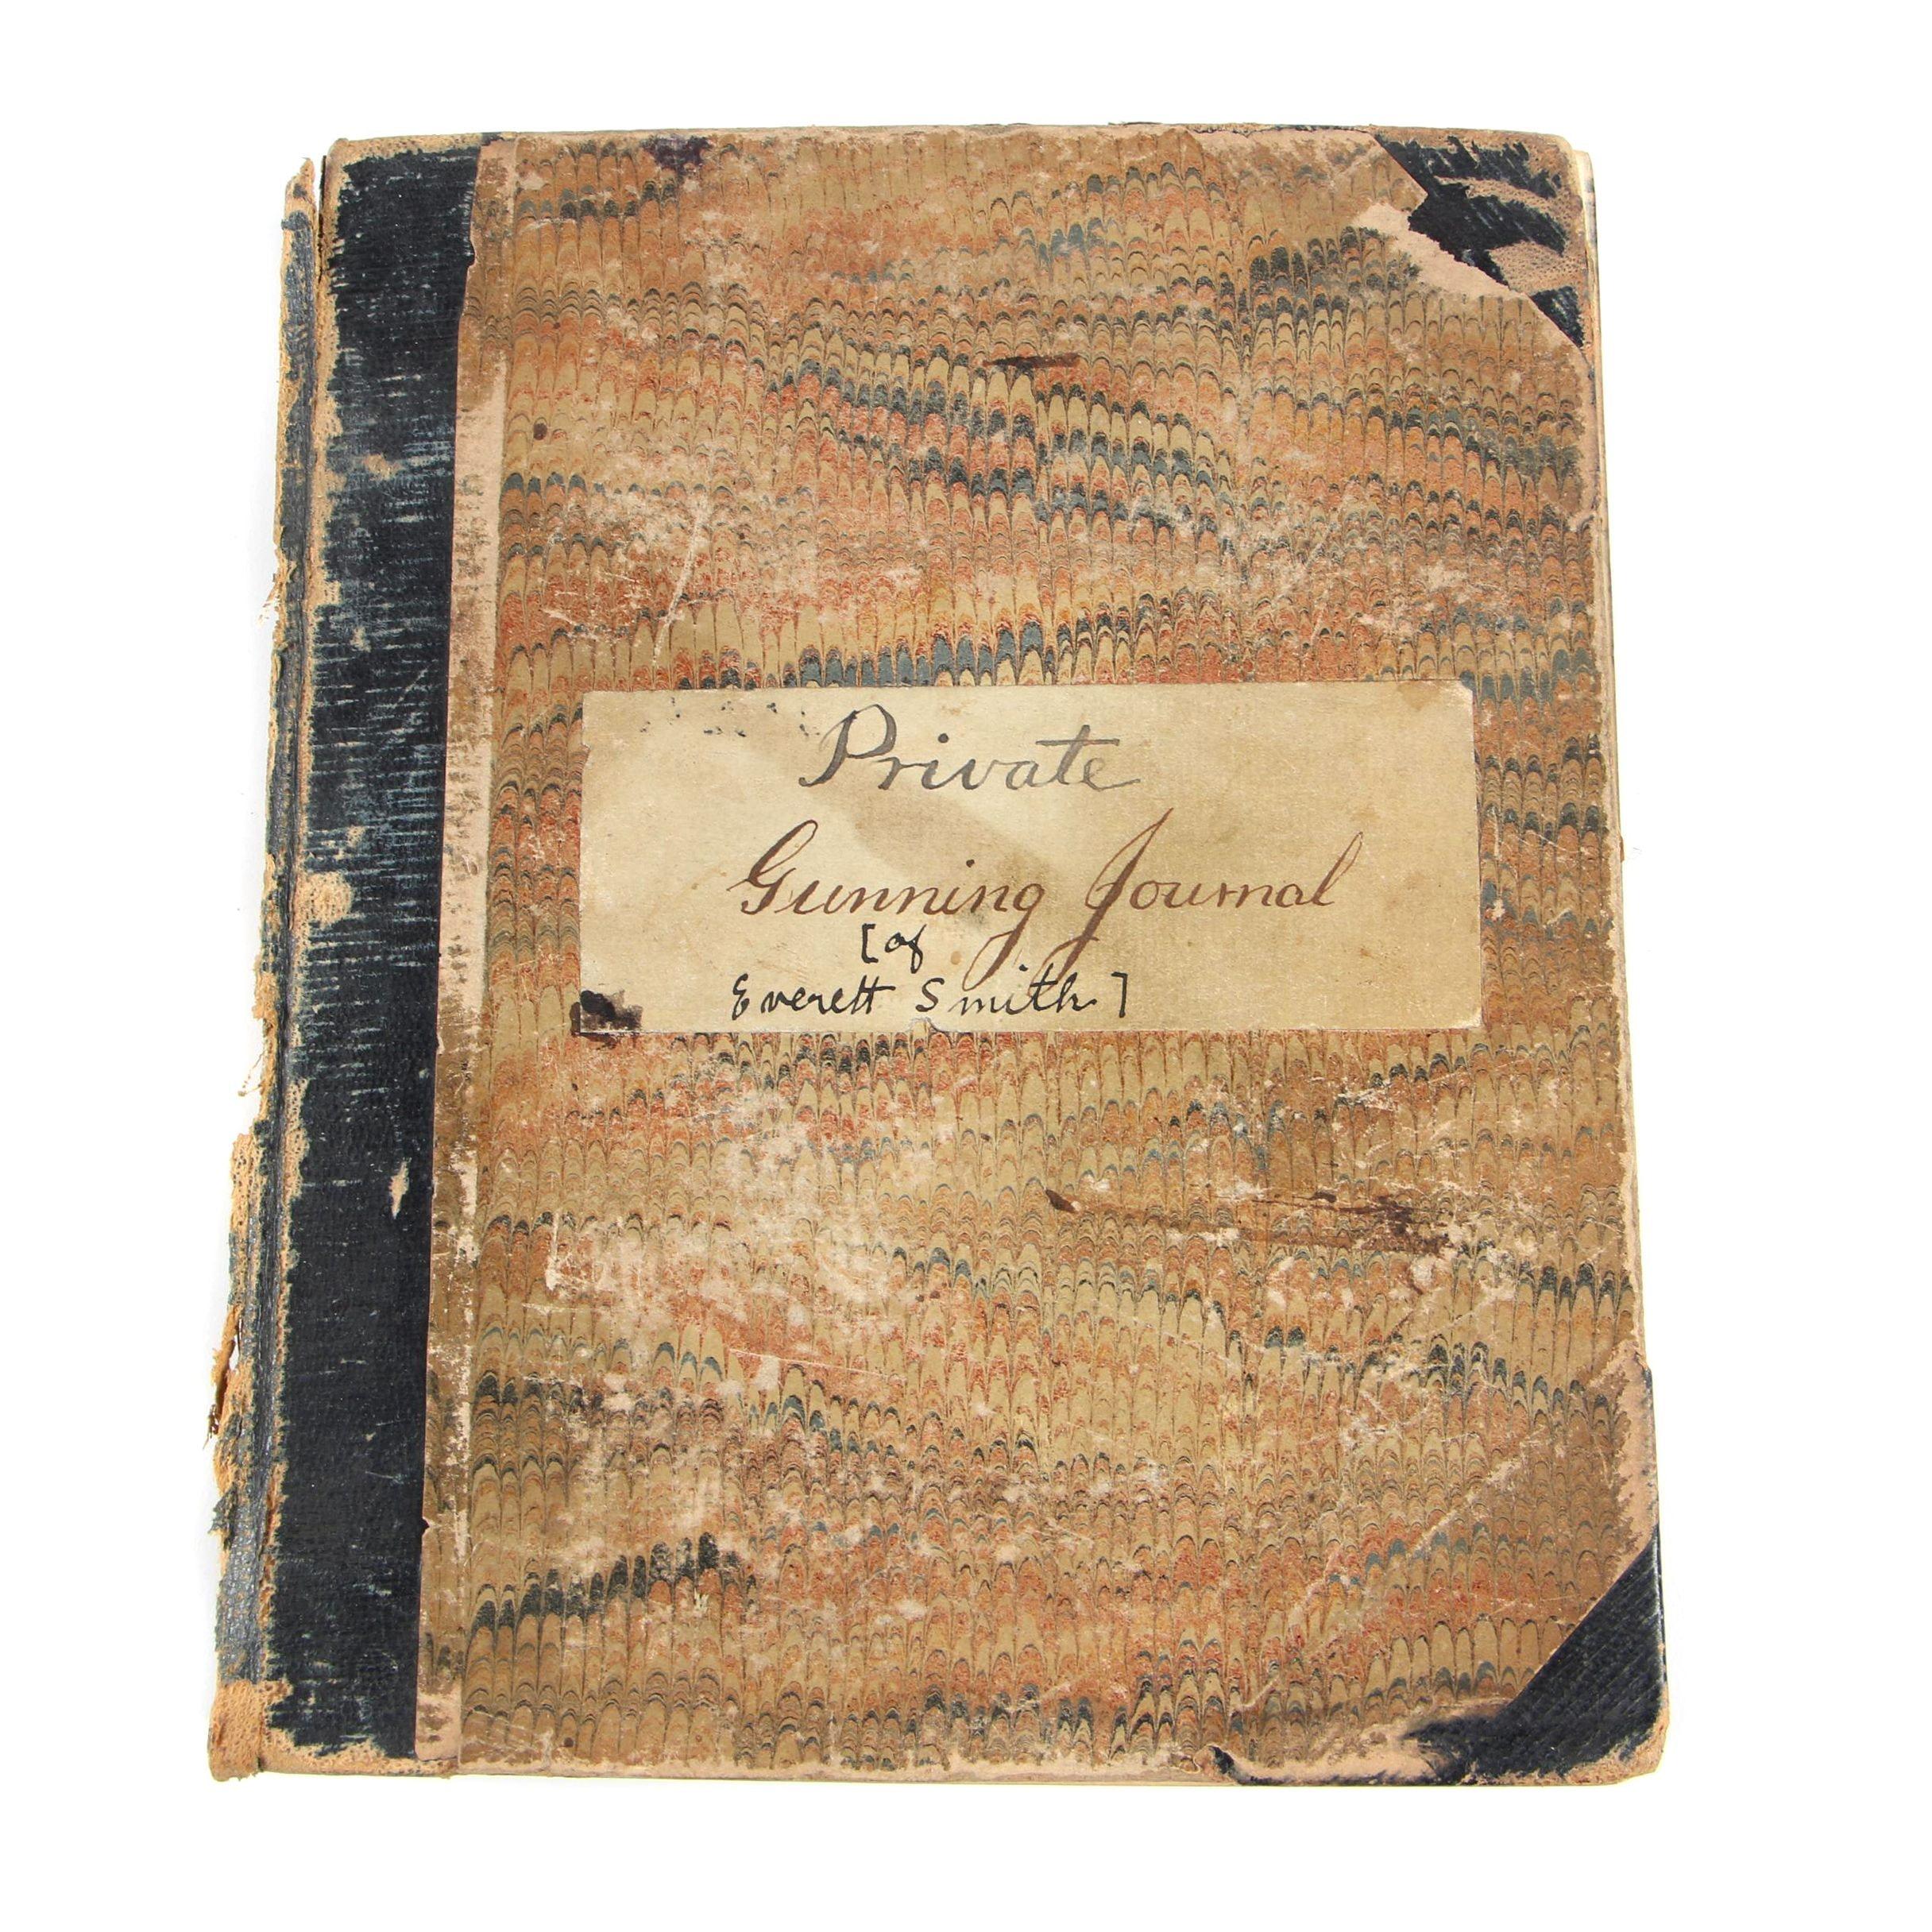 The Private Gunning Journal of Everett Smith, 1866-1880